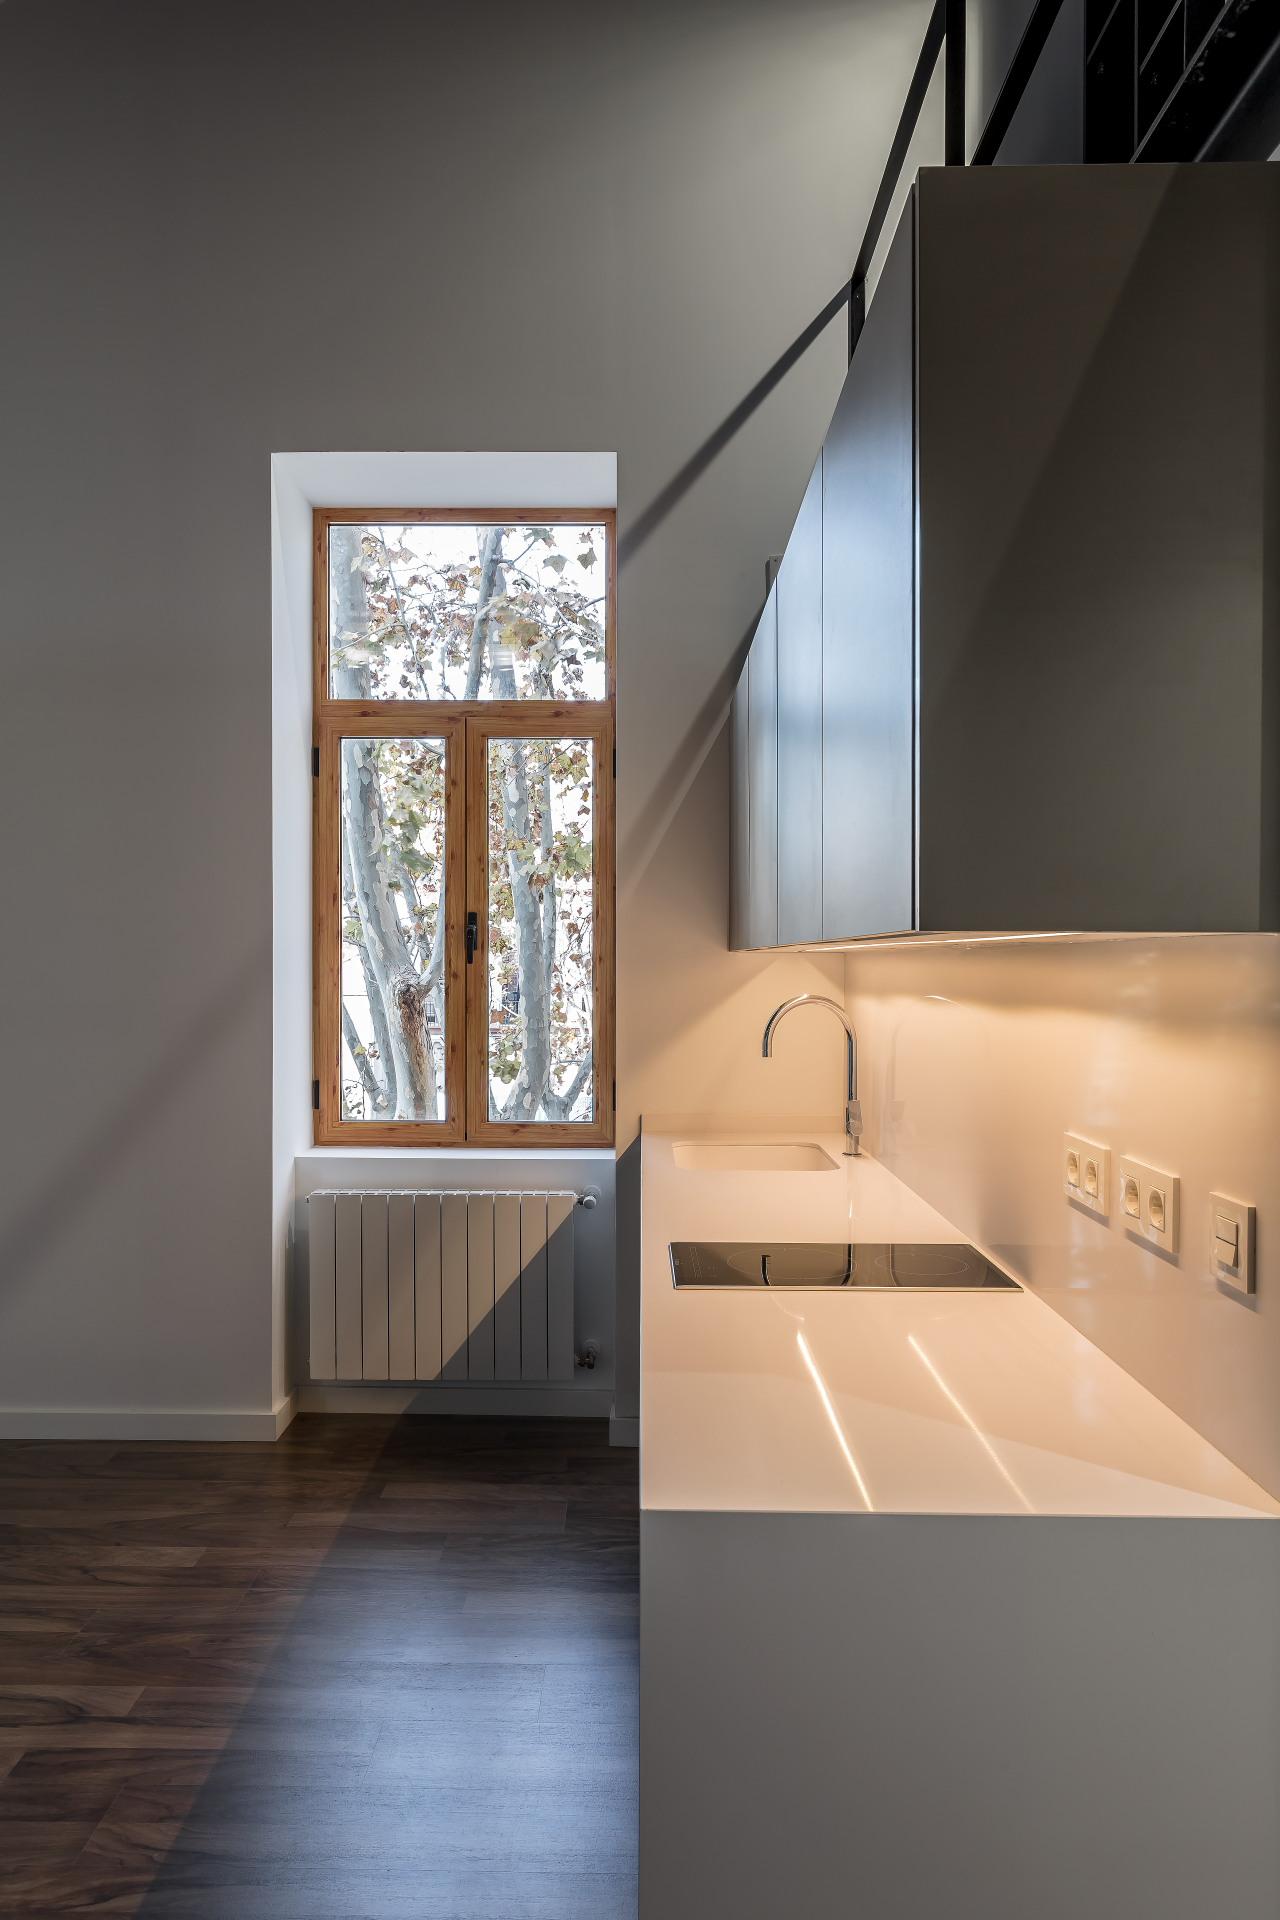 fotografia-arquitectura-valencia-german-cabo-viraje-rehabilitacion-campanar (21)